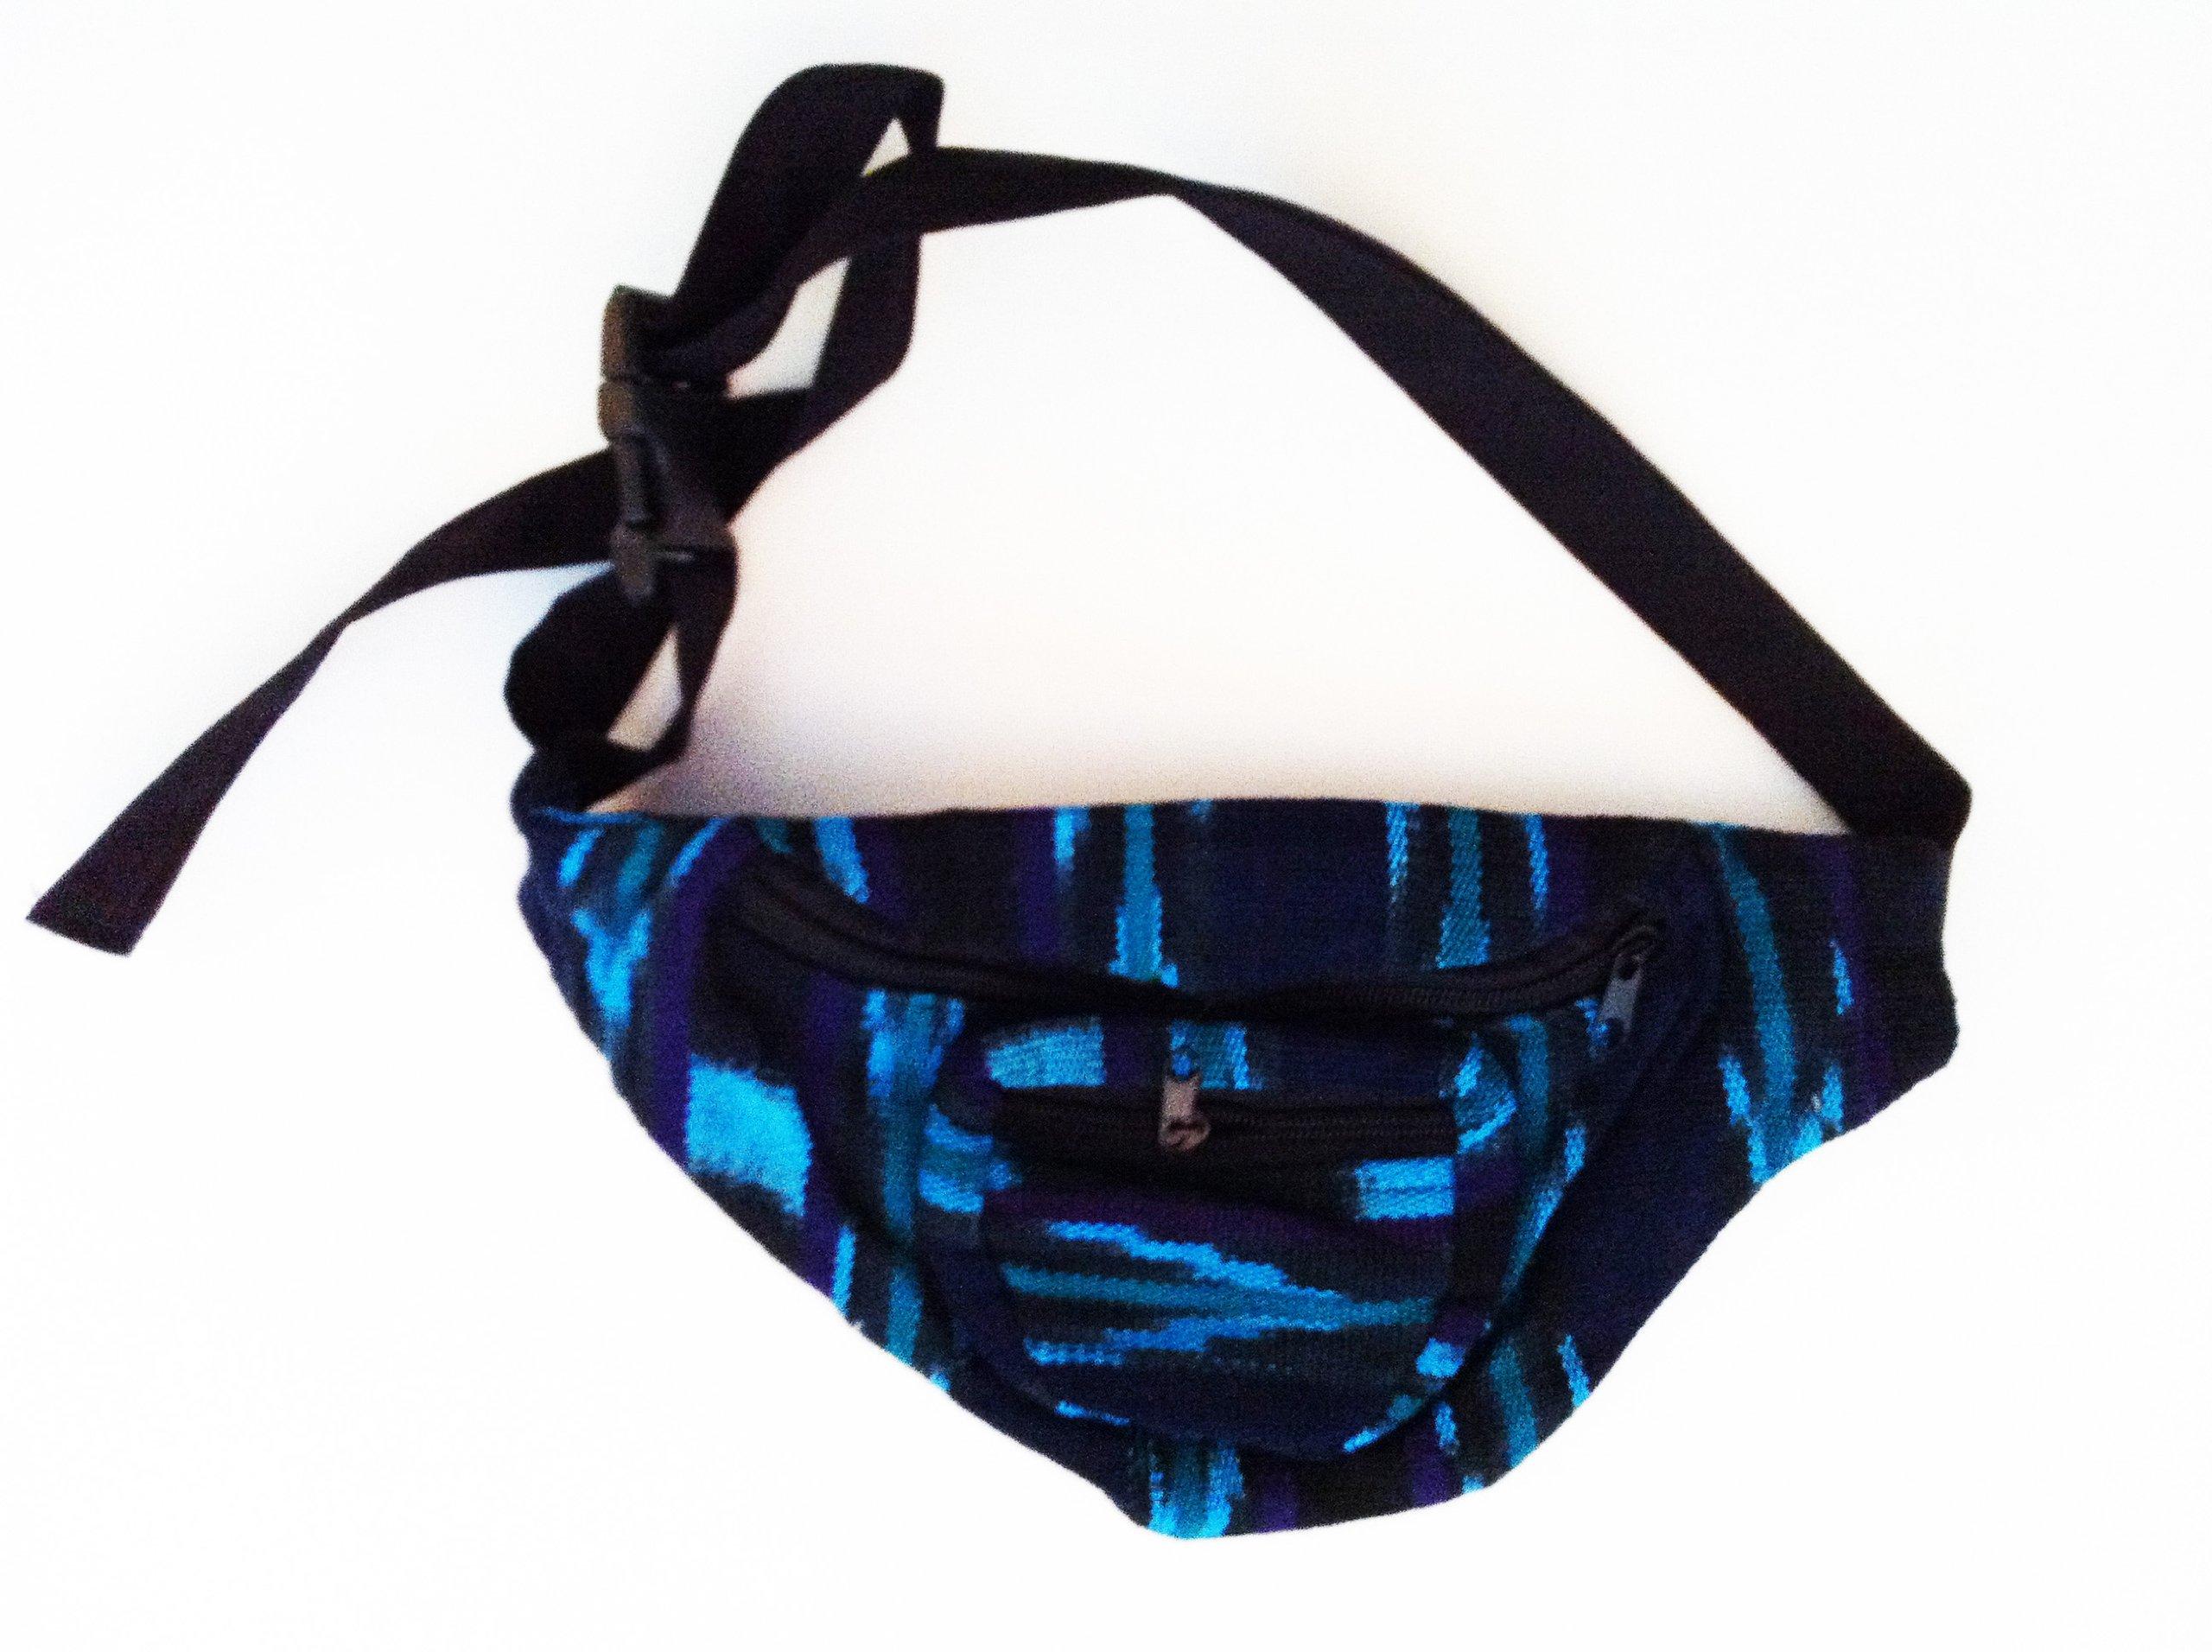 Blue Fabric Fanny Pack Handmade in Guatemala